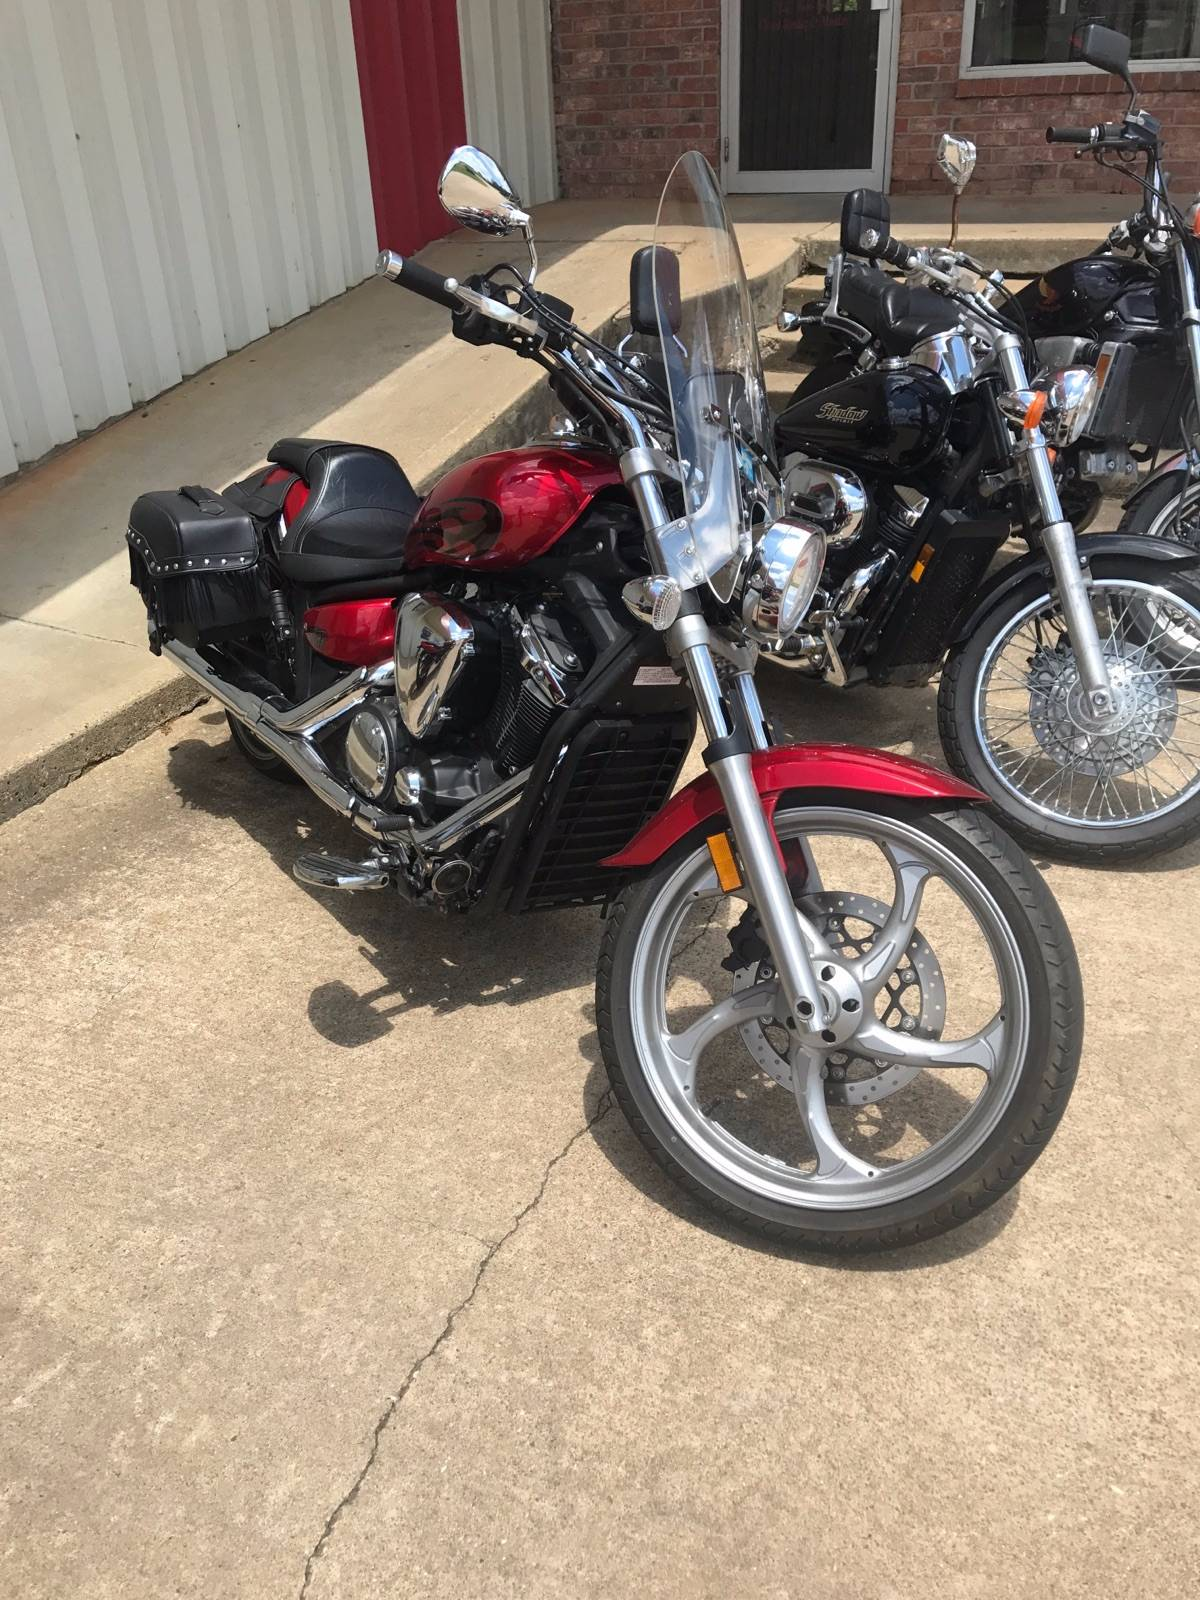 2012 Yamaha Stryker for sale 26851